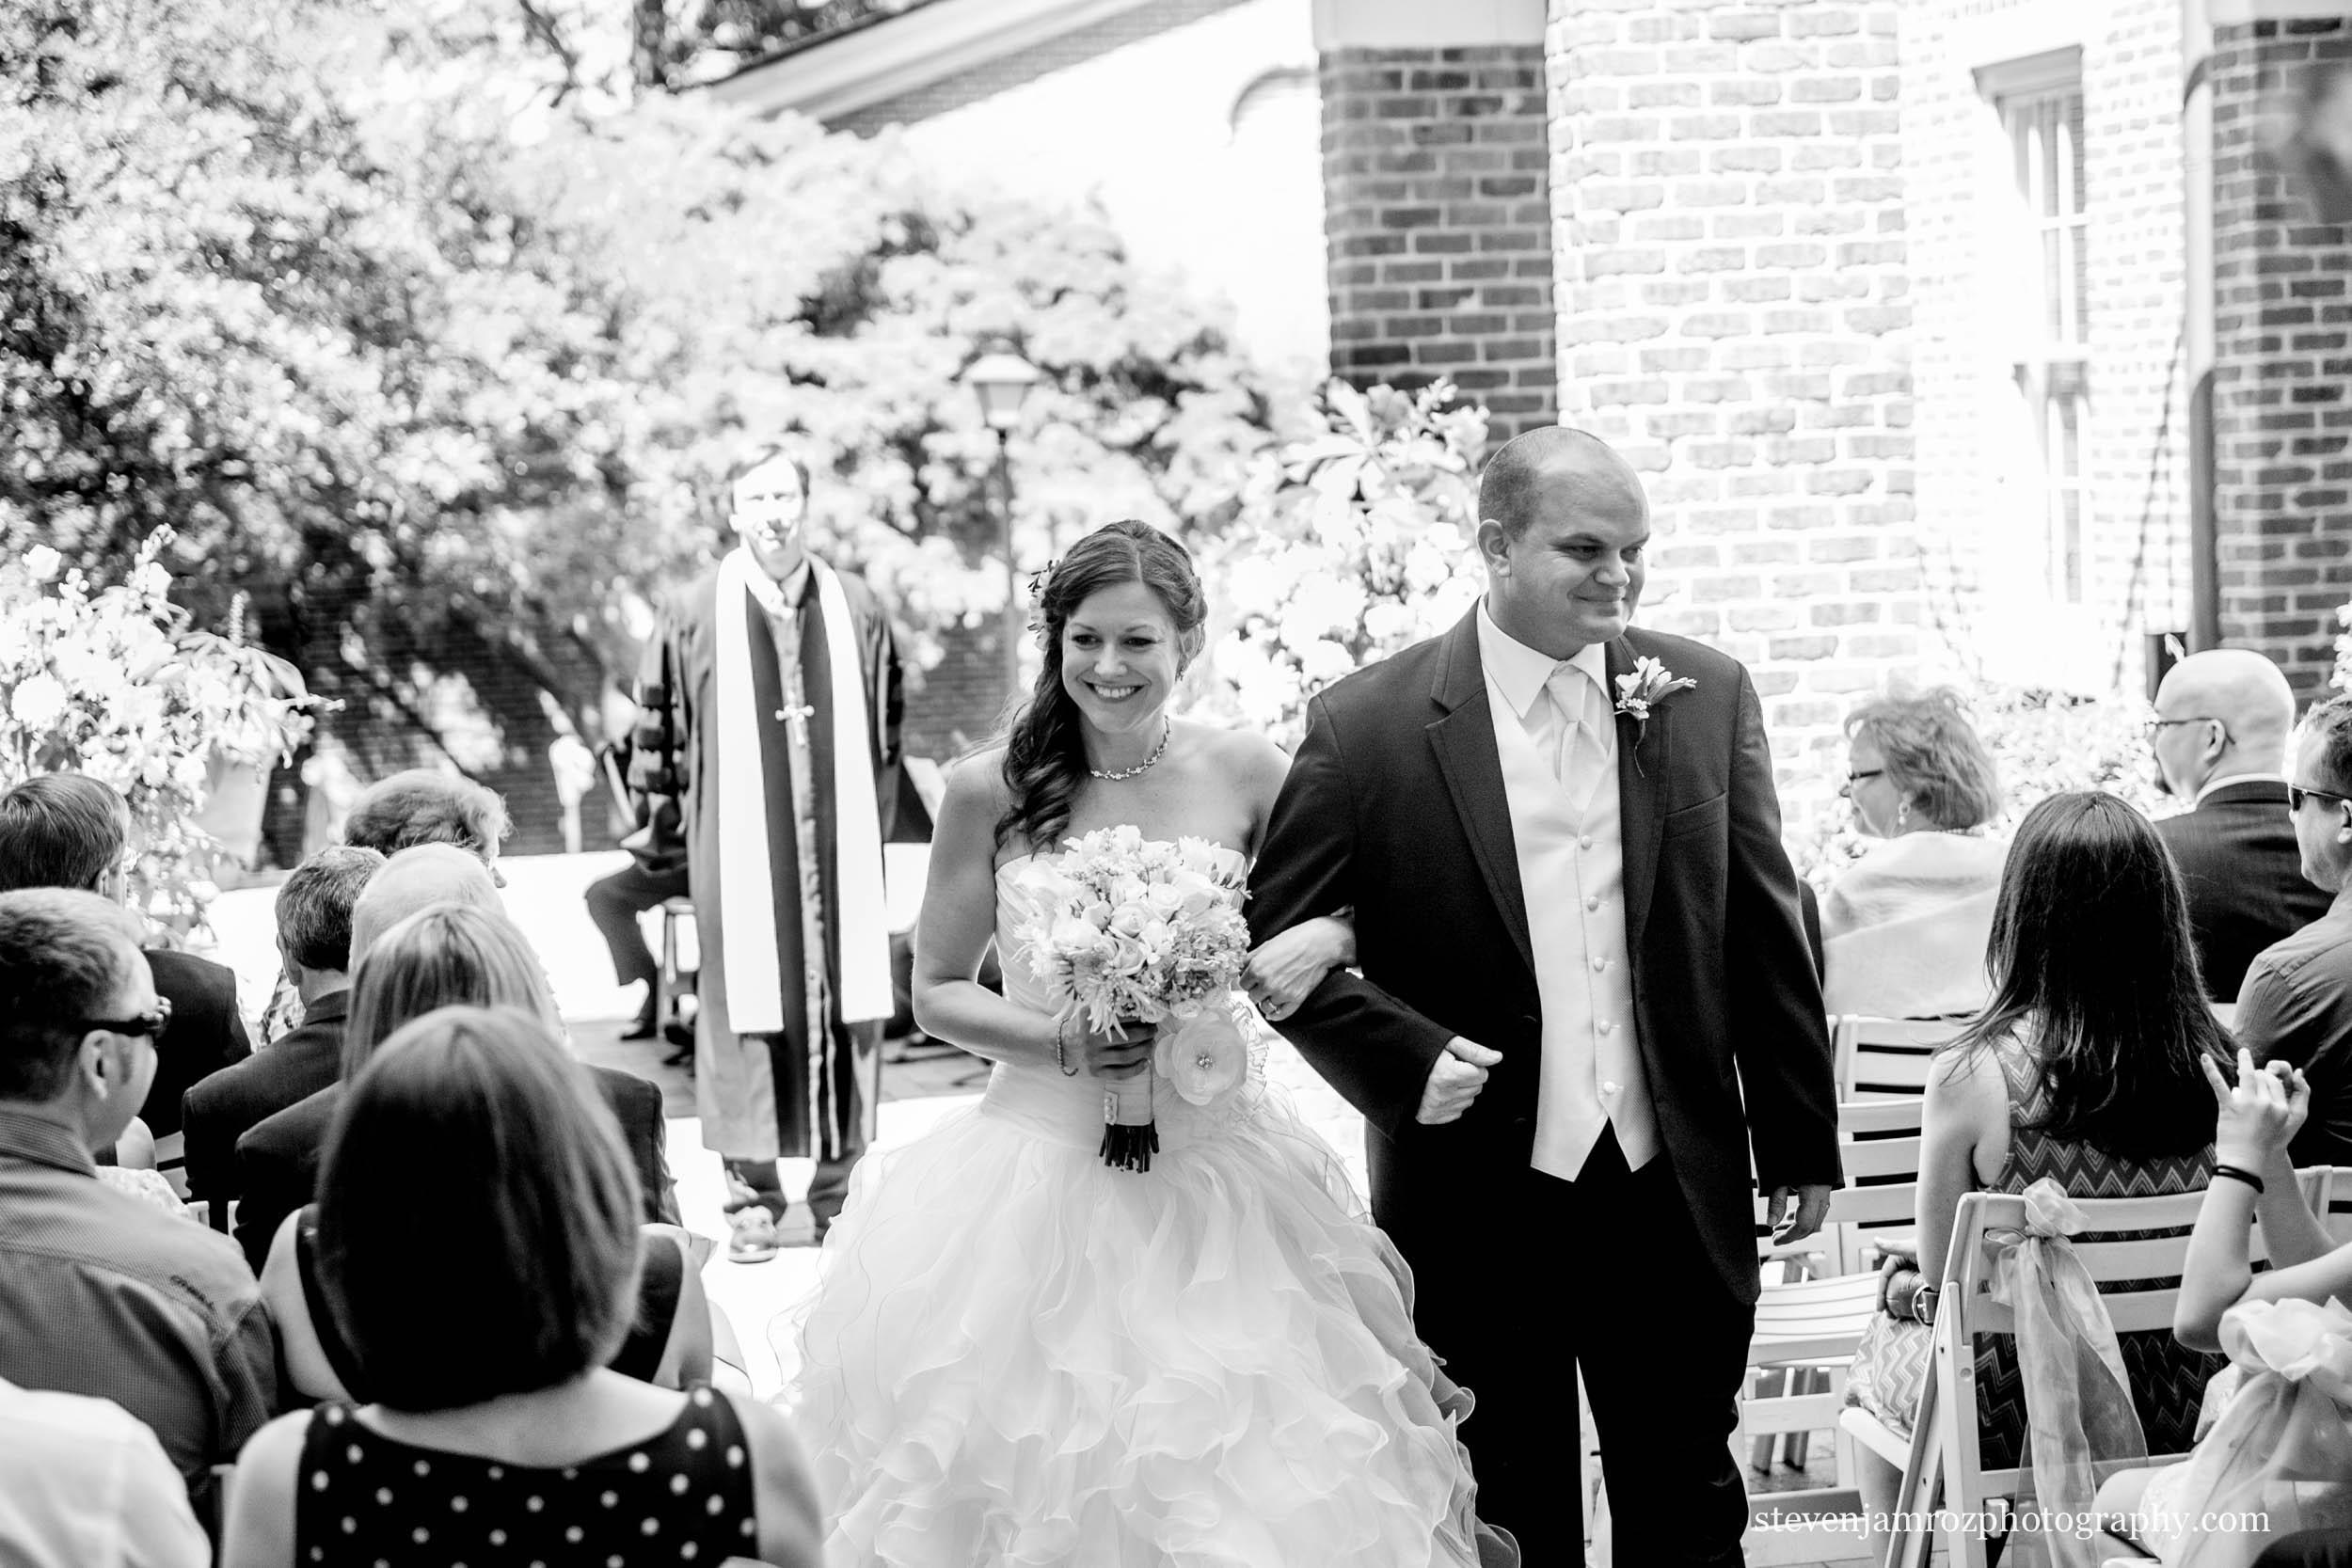 peace-college-just-married-wedding-photographer-steven-jamroz-0730.jpg